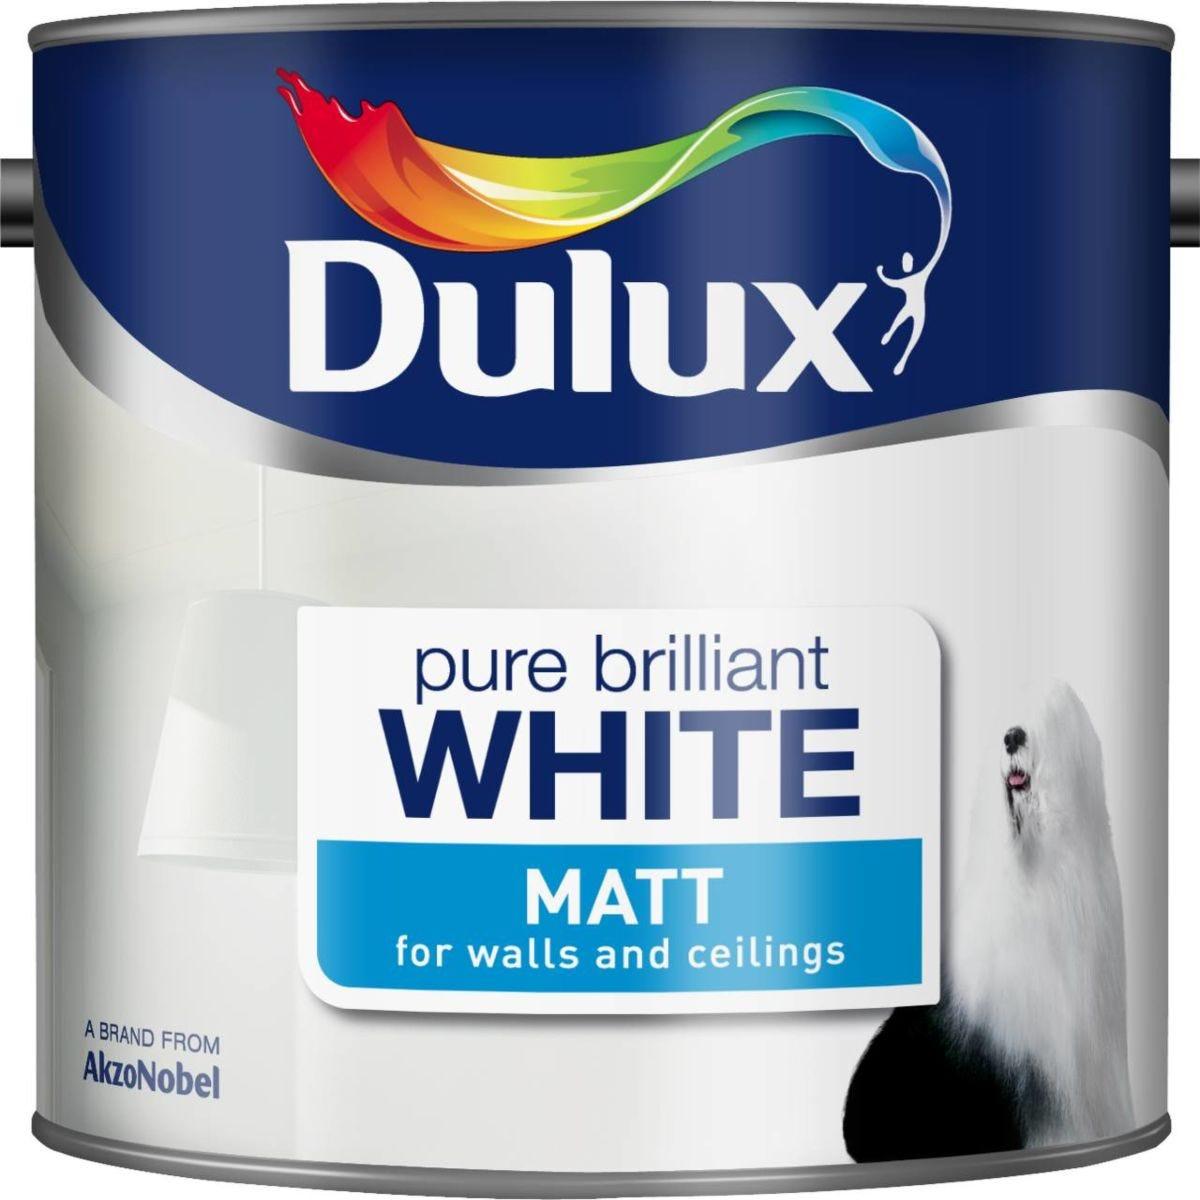 Dulux Matt Pure Brilliant White Paint - 2.5L